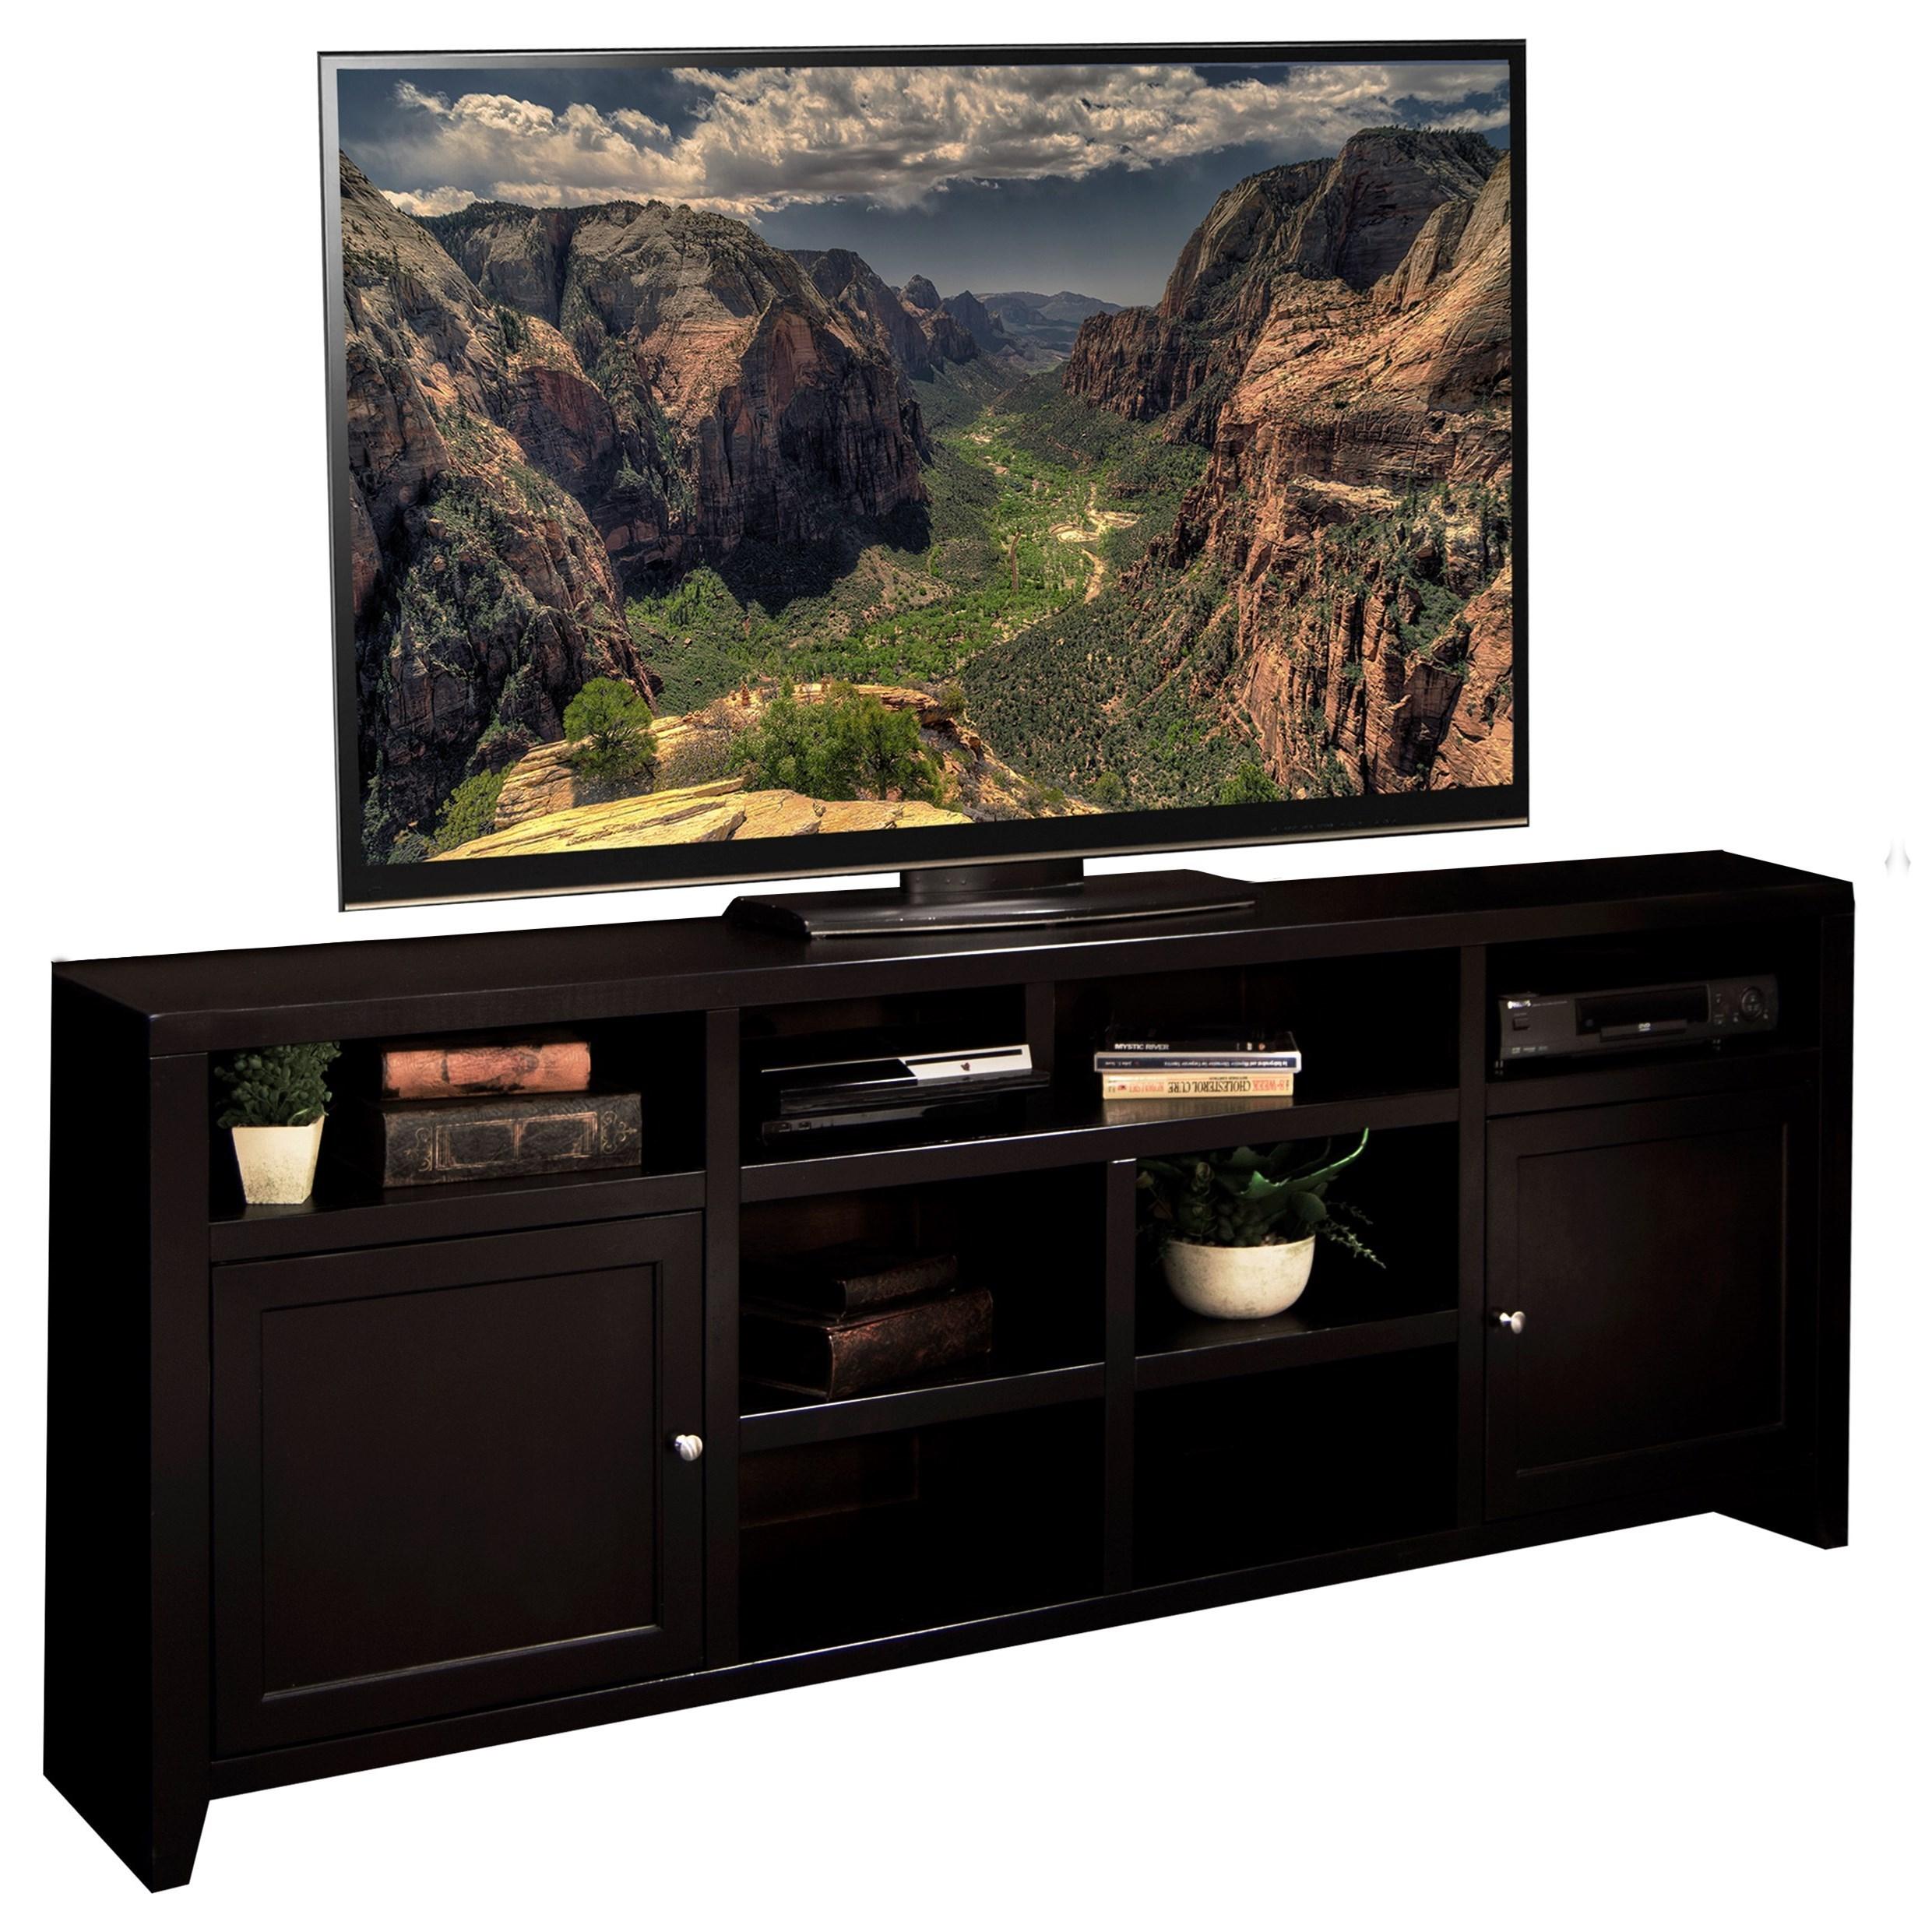 "Legends Furniture Urban Loft 84"" TV Super Console - Item Number: UL1284.MOC"